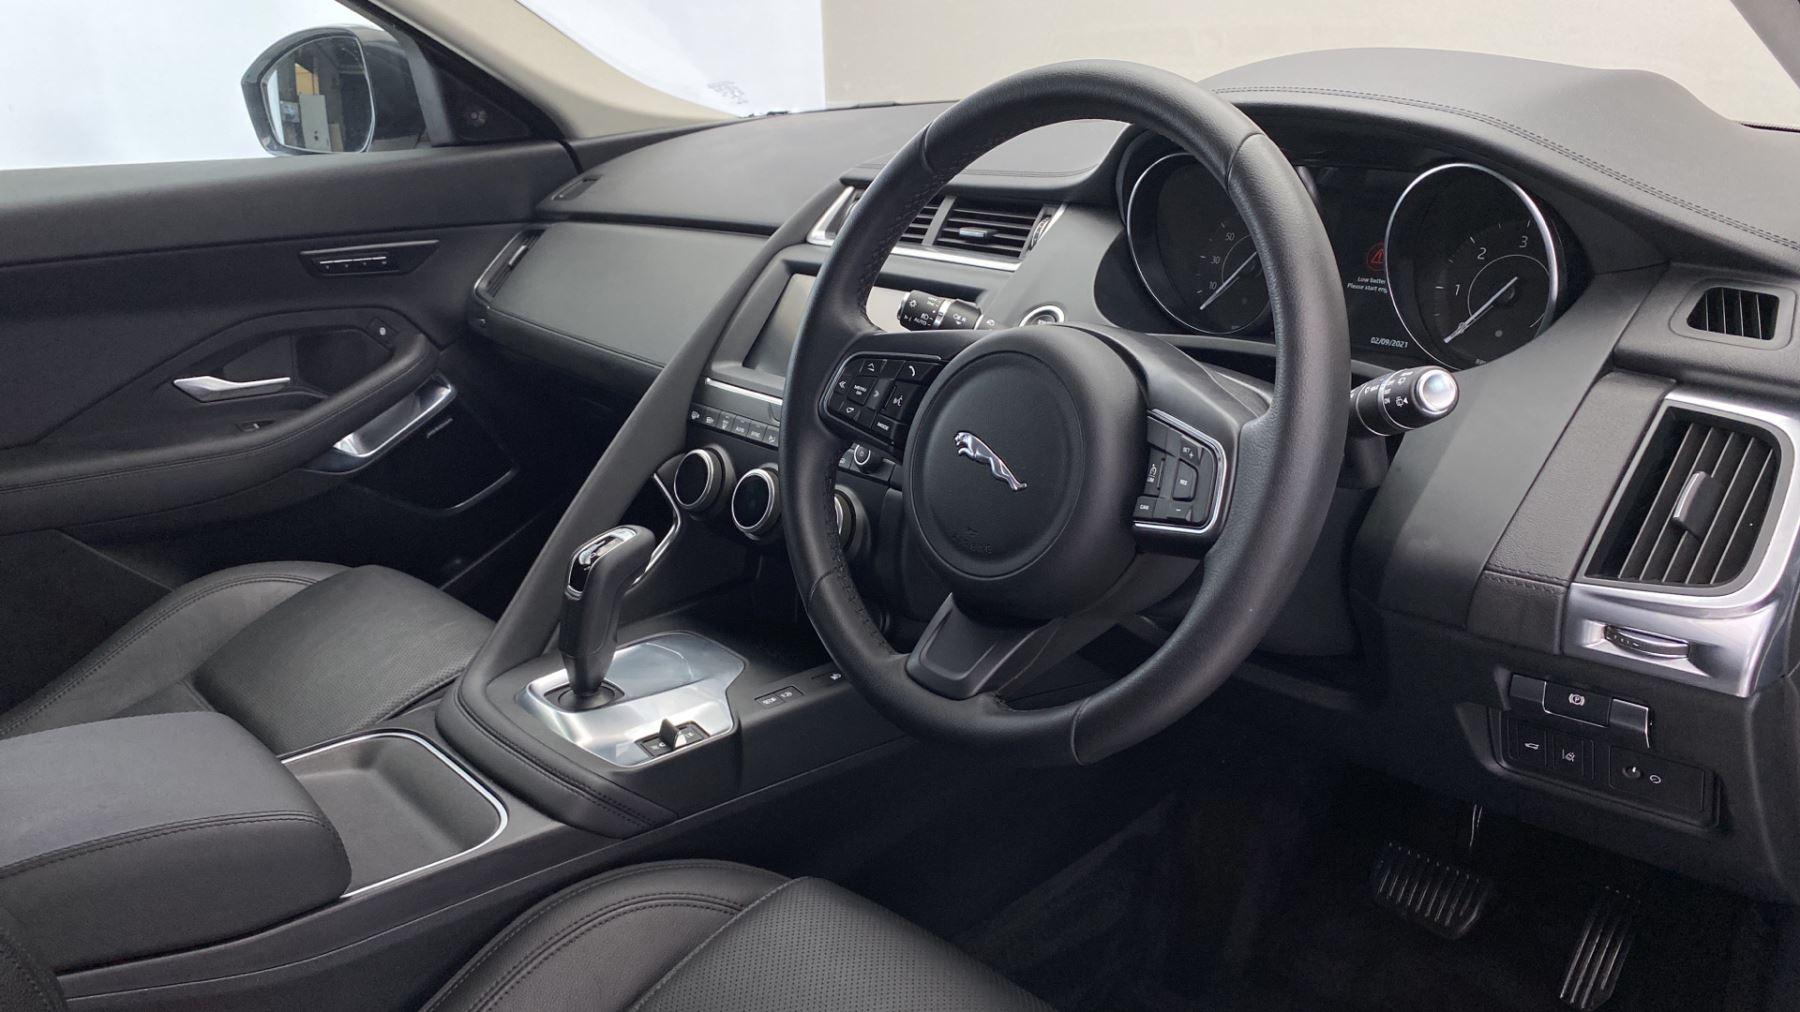 Jaguar E-PACE 2.0d SE AWD - Meridian Sound System - Powered Seats - Satellite Navigation image 9